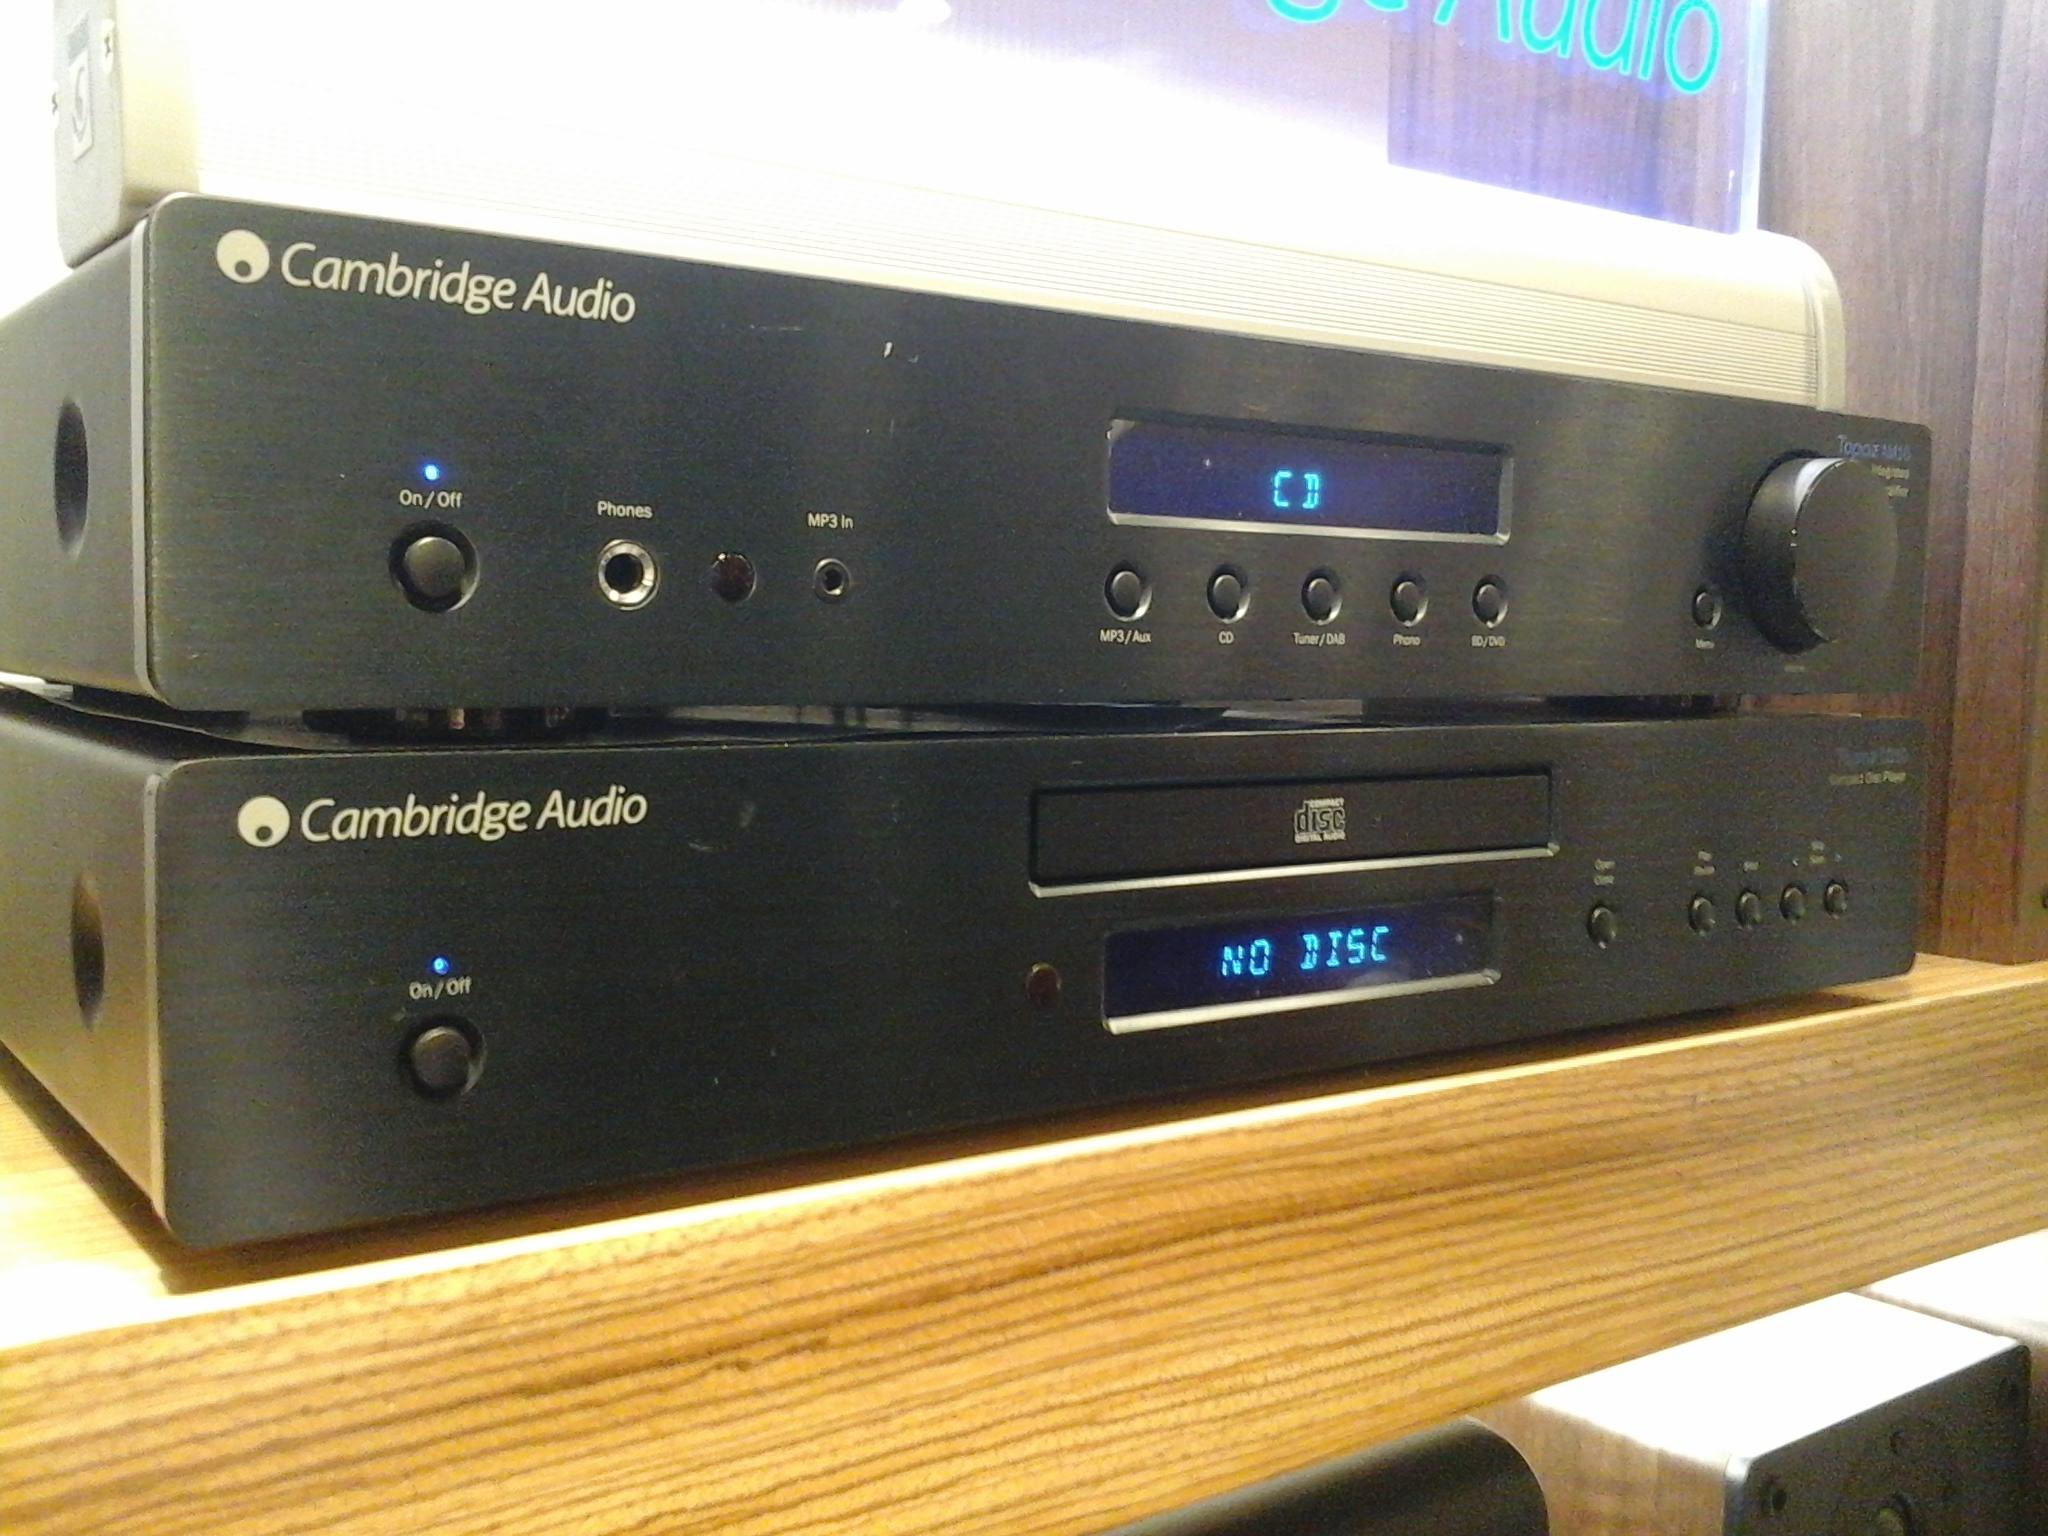 File:Cambridge audio CD & amp.jpg - Wikimedia Commons